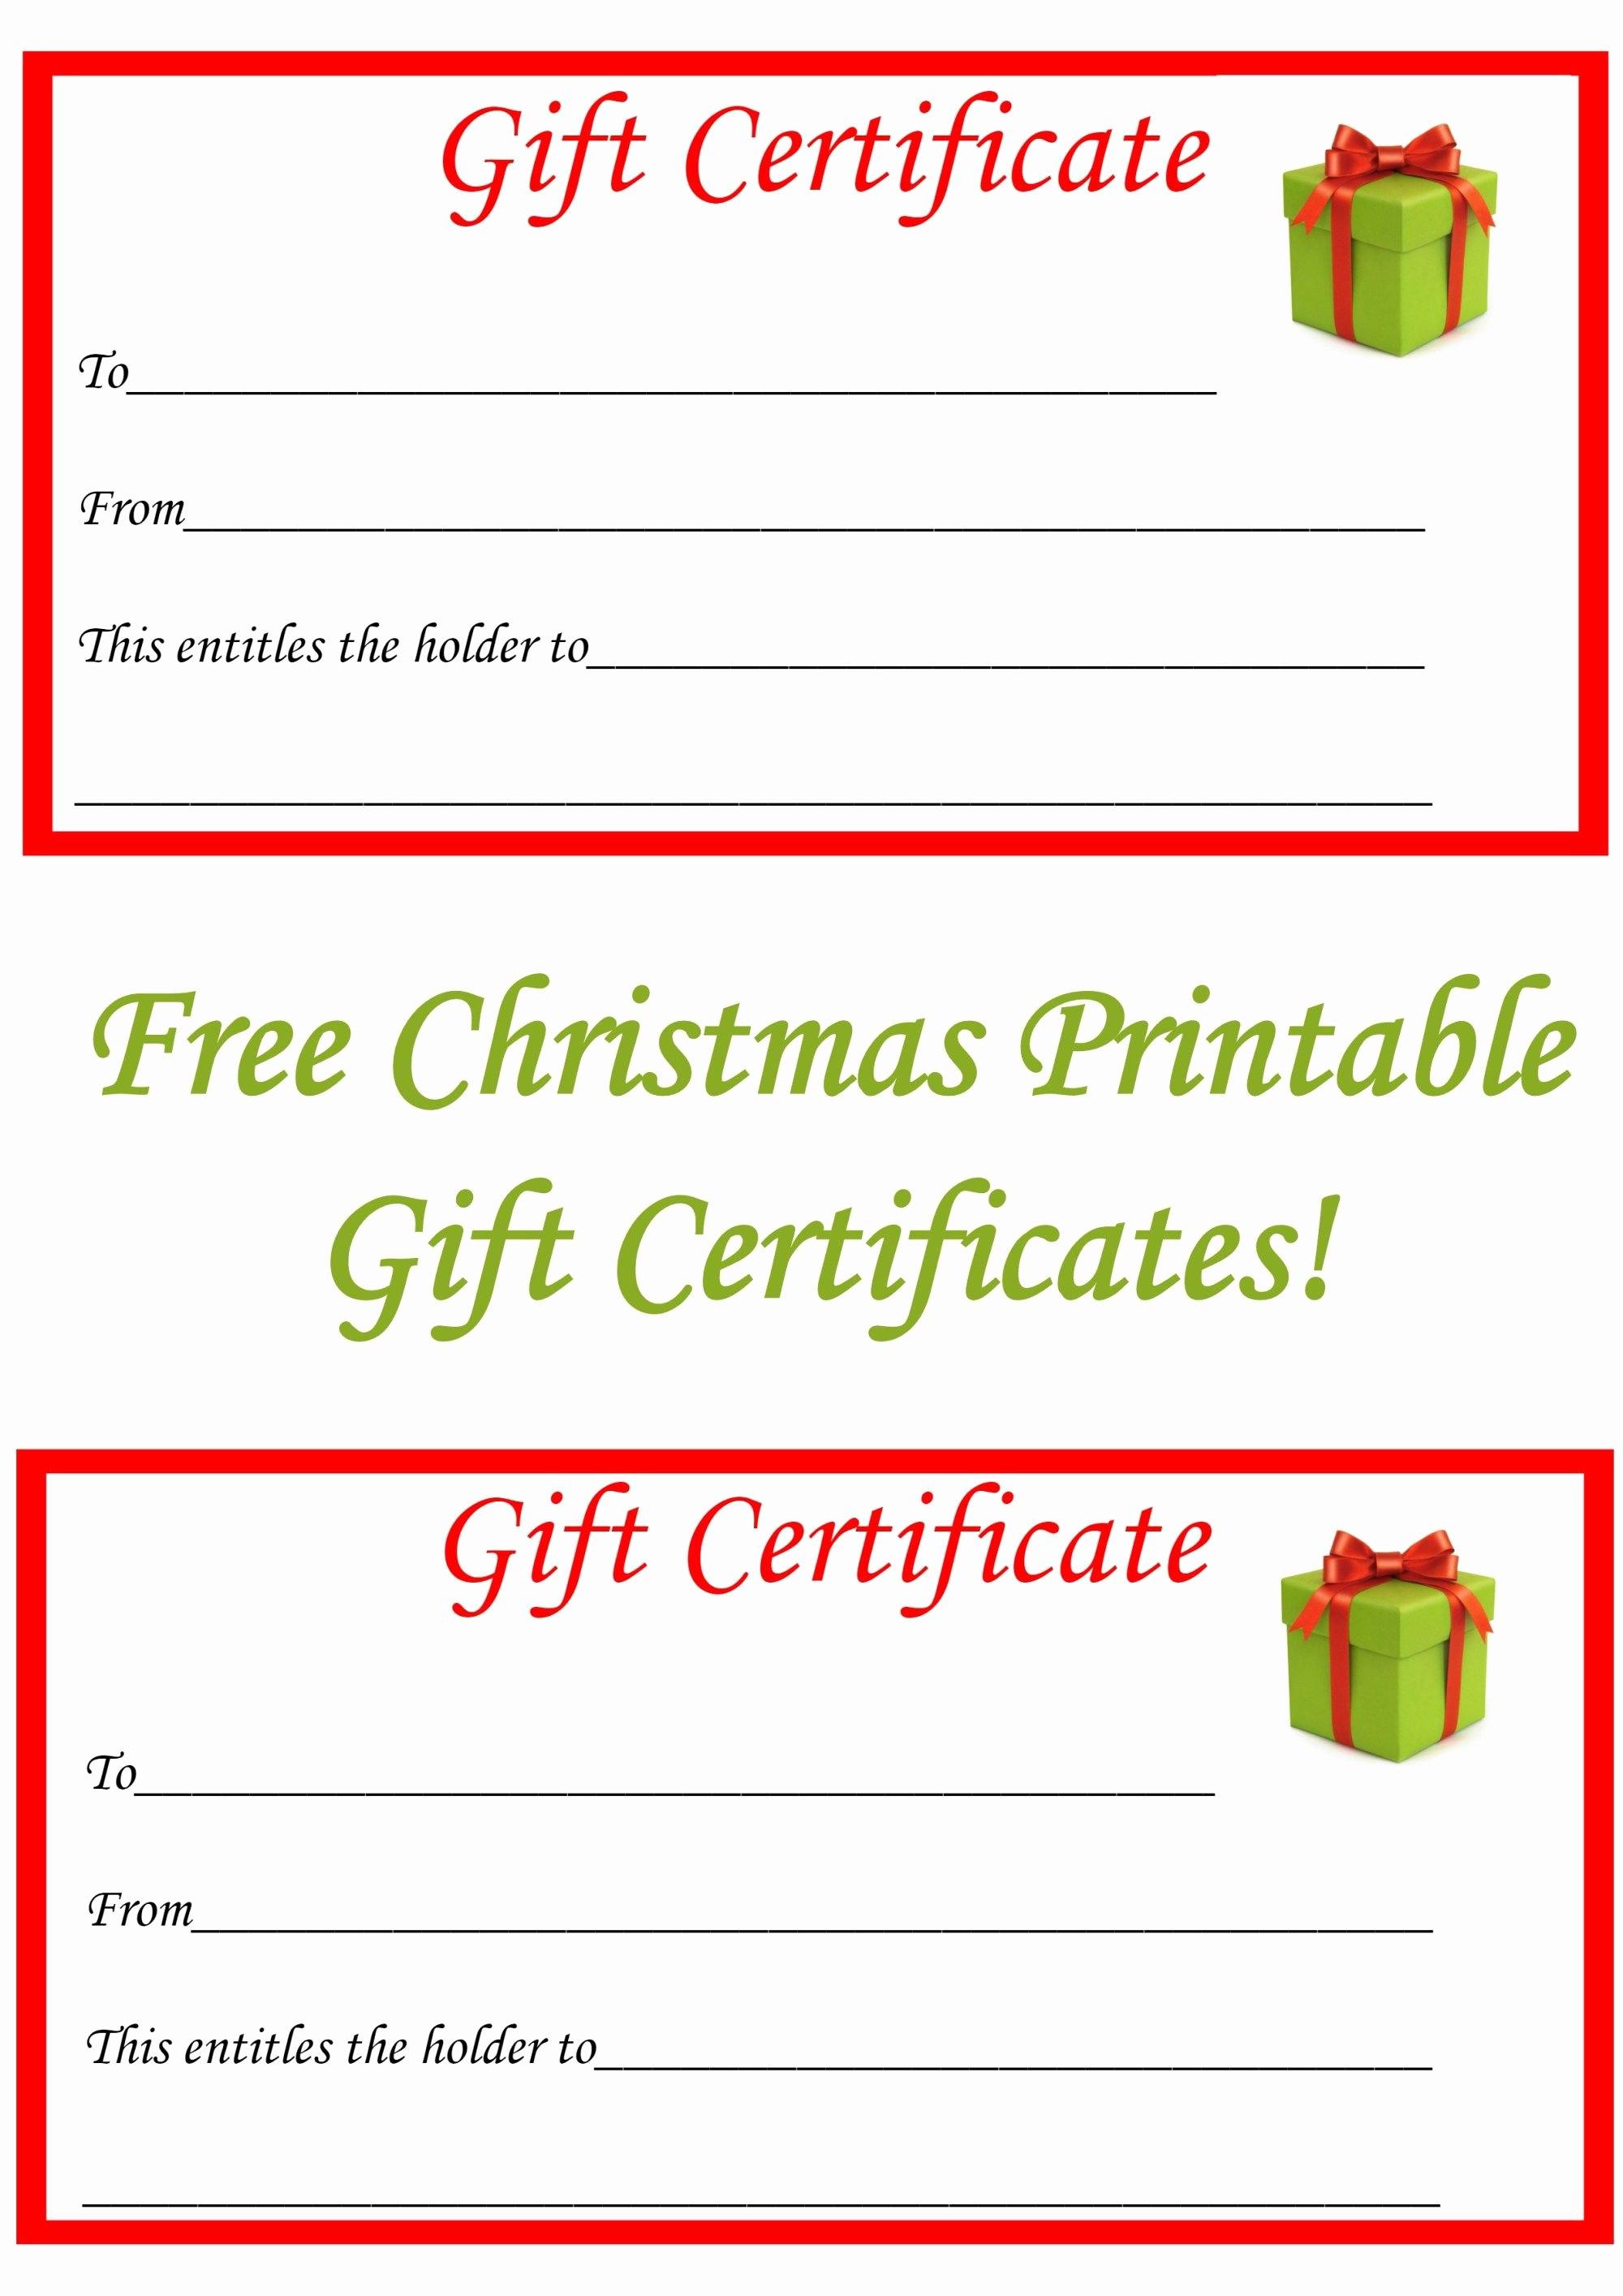 Best Of Golf Gift Certificate Template  Alaskafreepress Pertaining To Tennis Gift Certificate Template